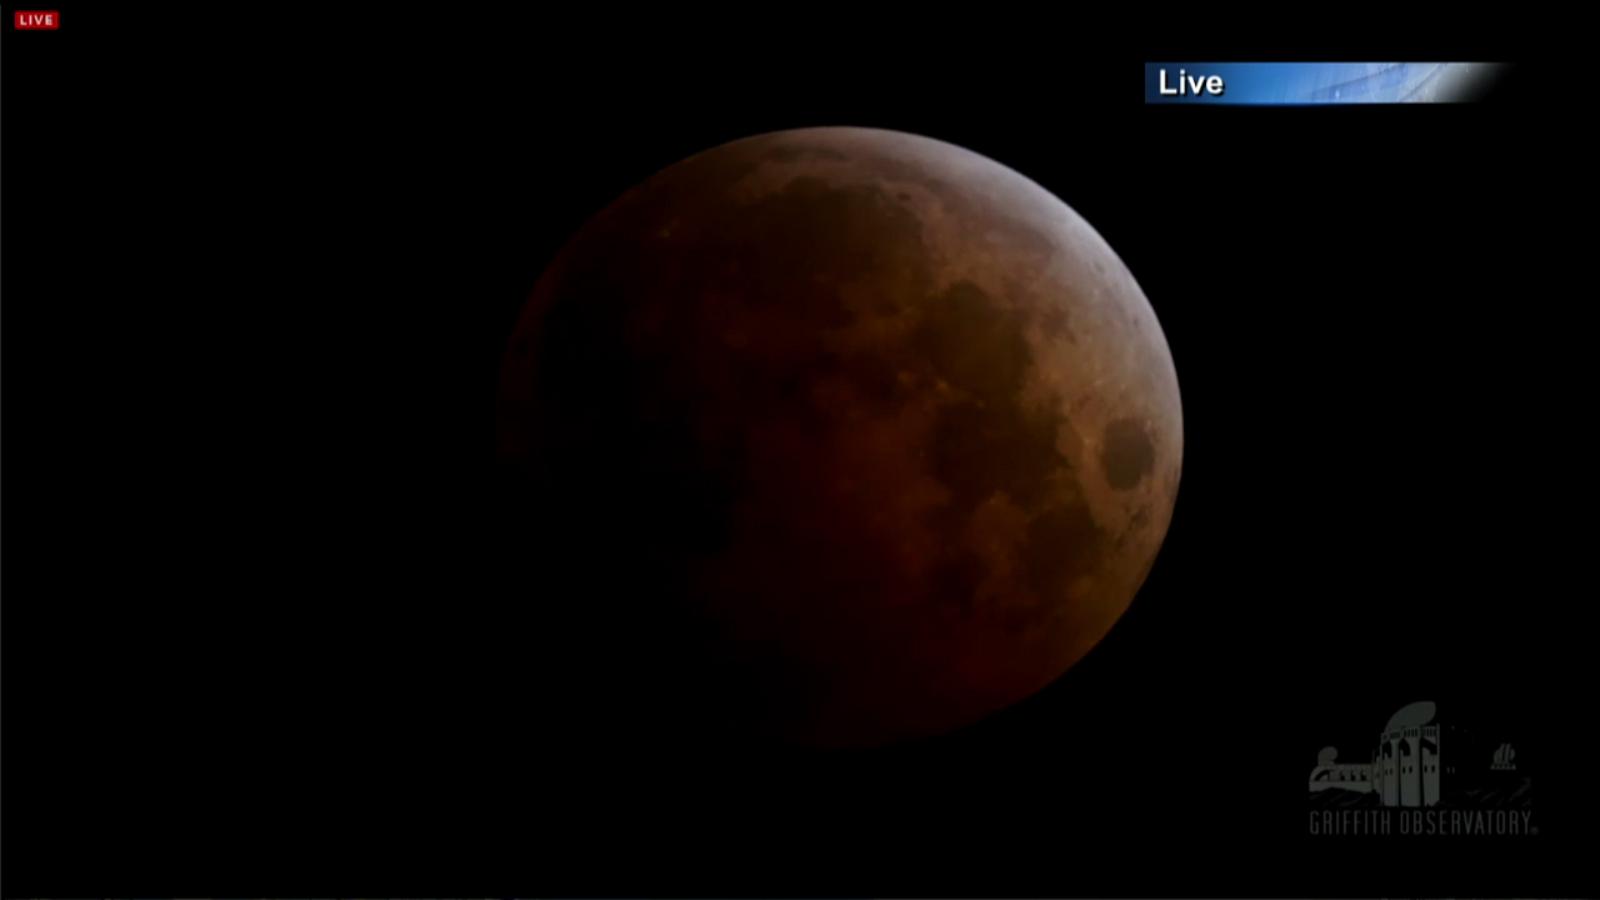 Blood Moon of October 2014 Lunar Eclipse